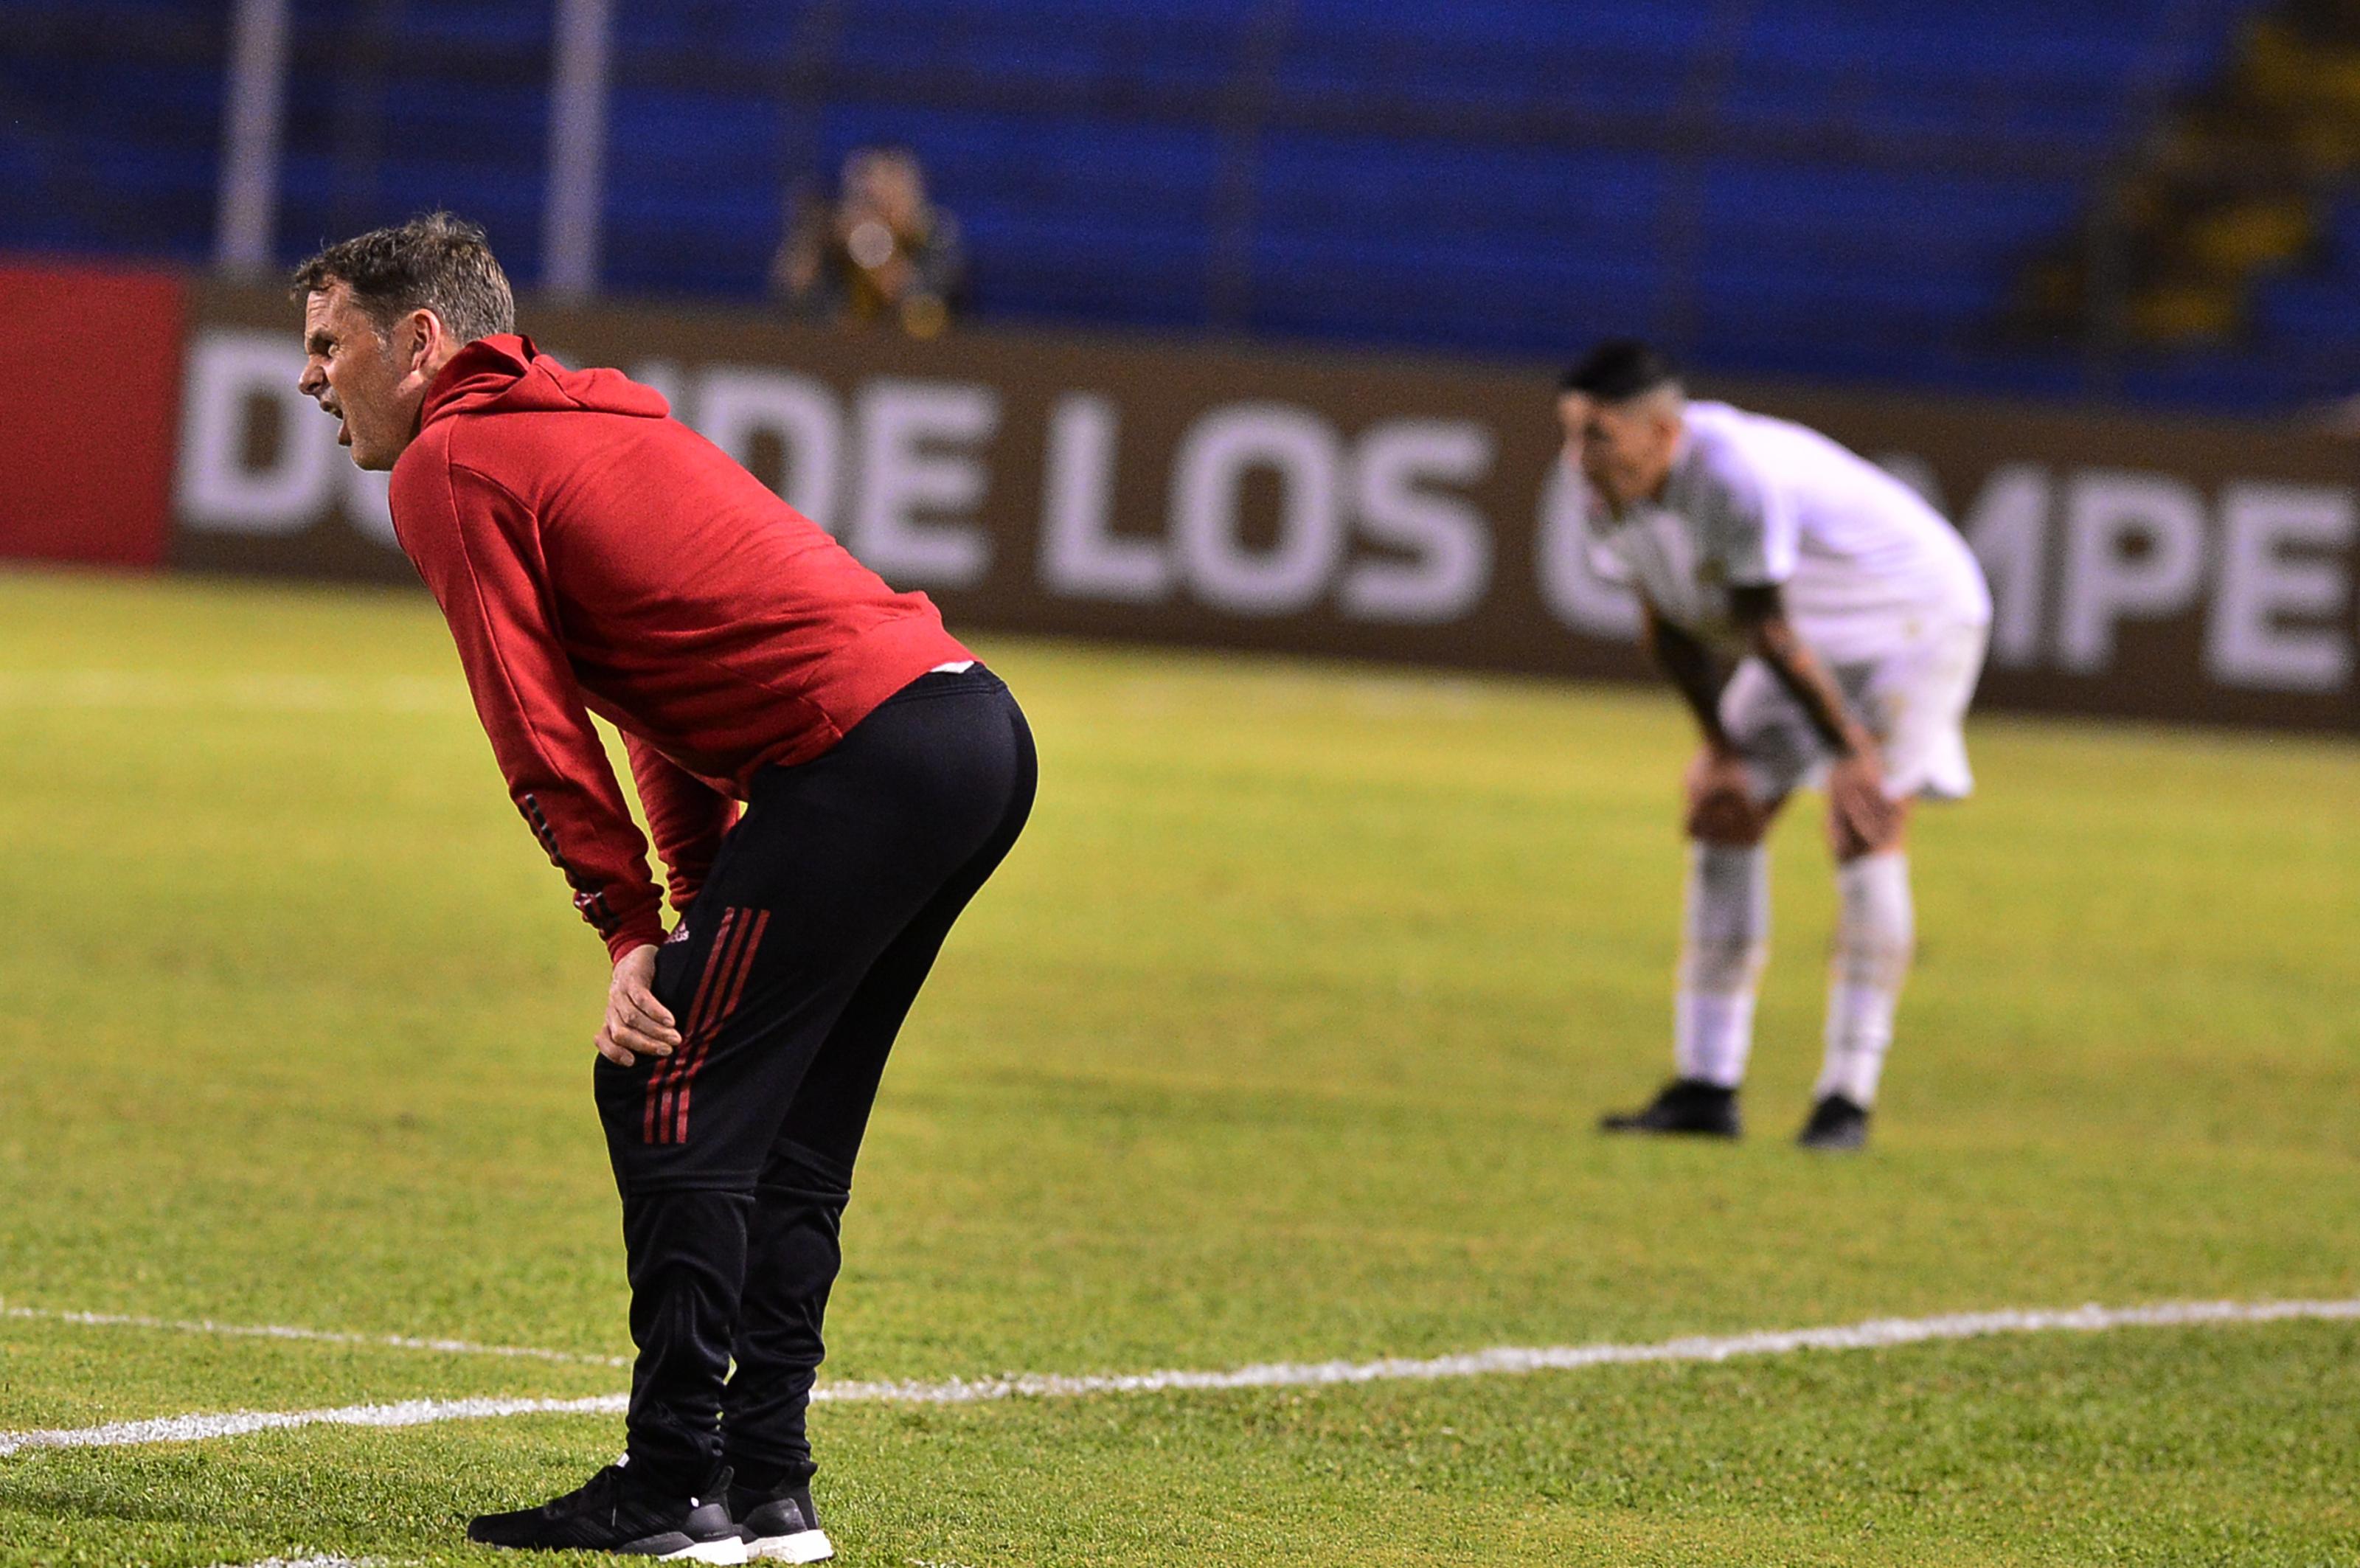 Atlanta United Vs Motagua: 3 things we learned – A positive result